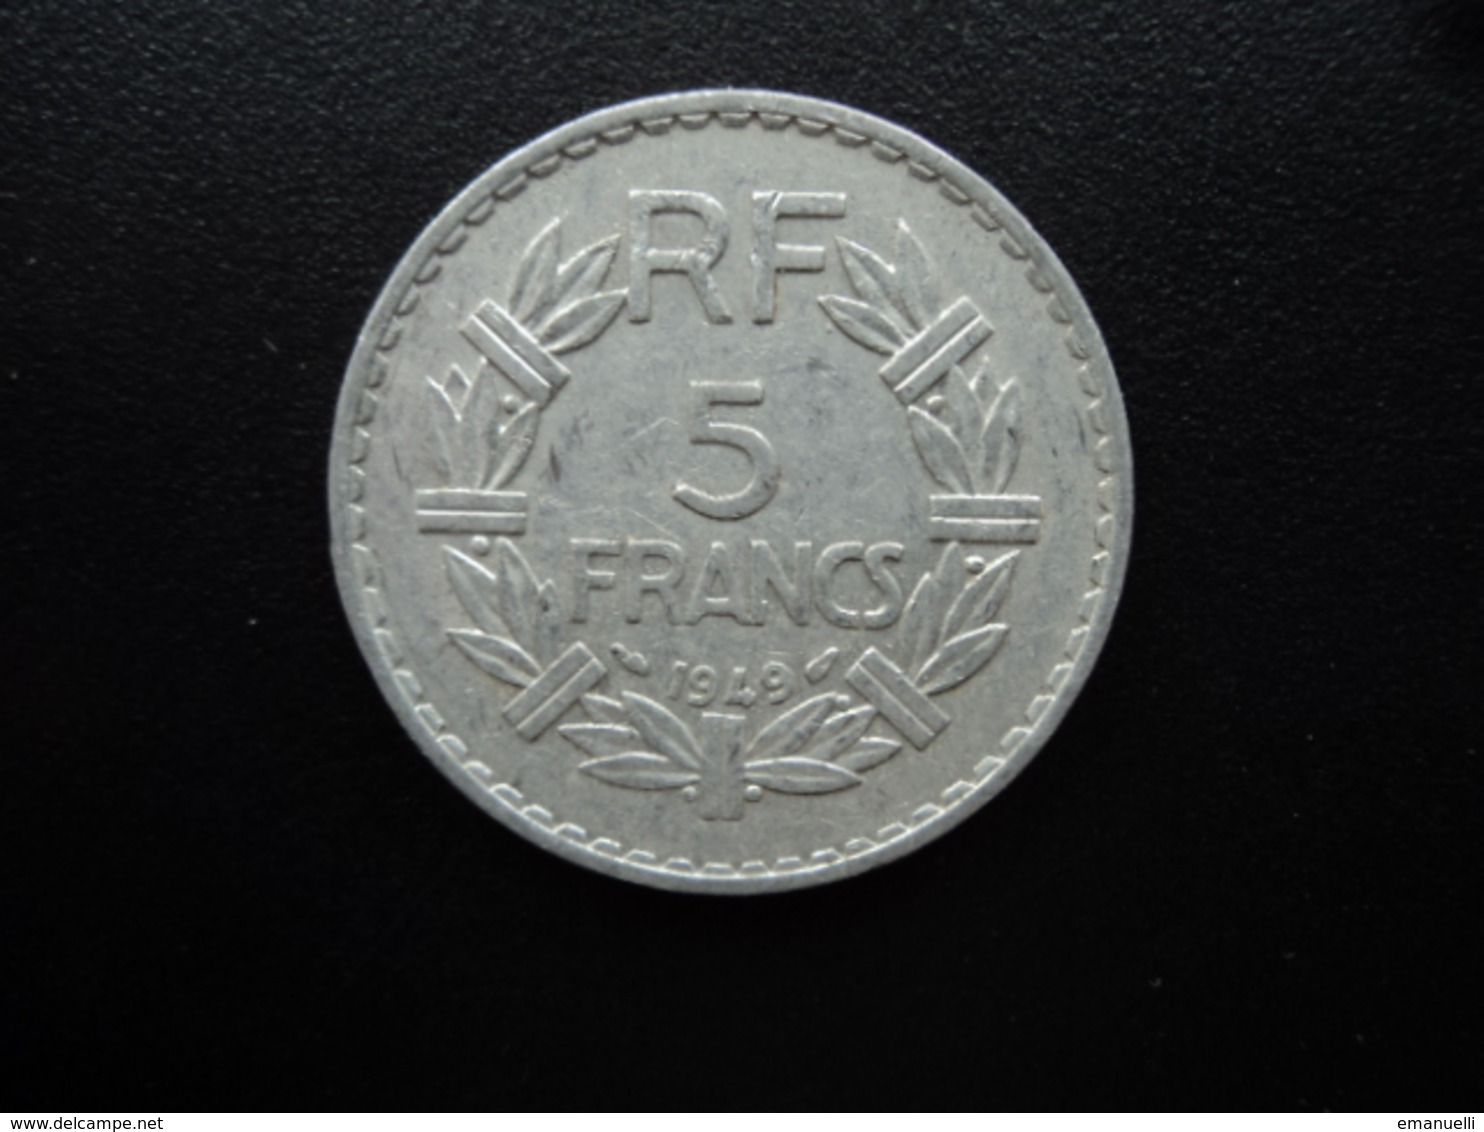 FRANCE : 5 FRANCS   1949   F.339.17 * / KM 888b.1     SUP - France